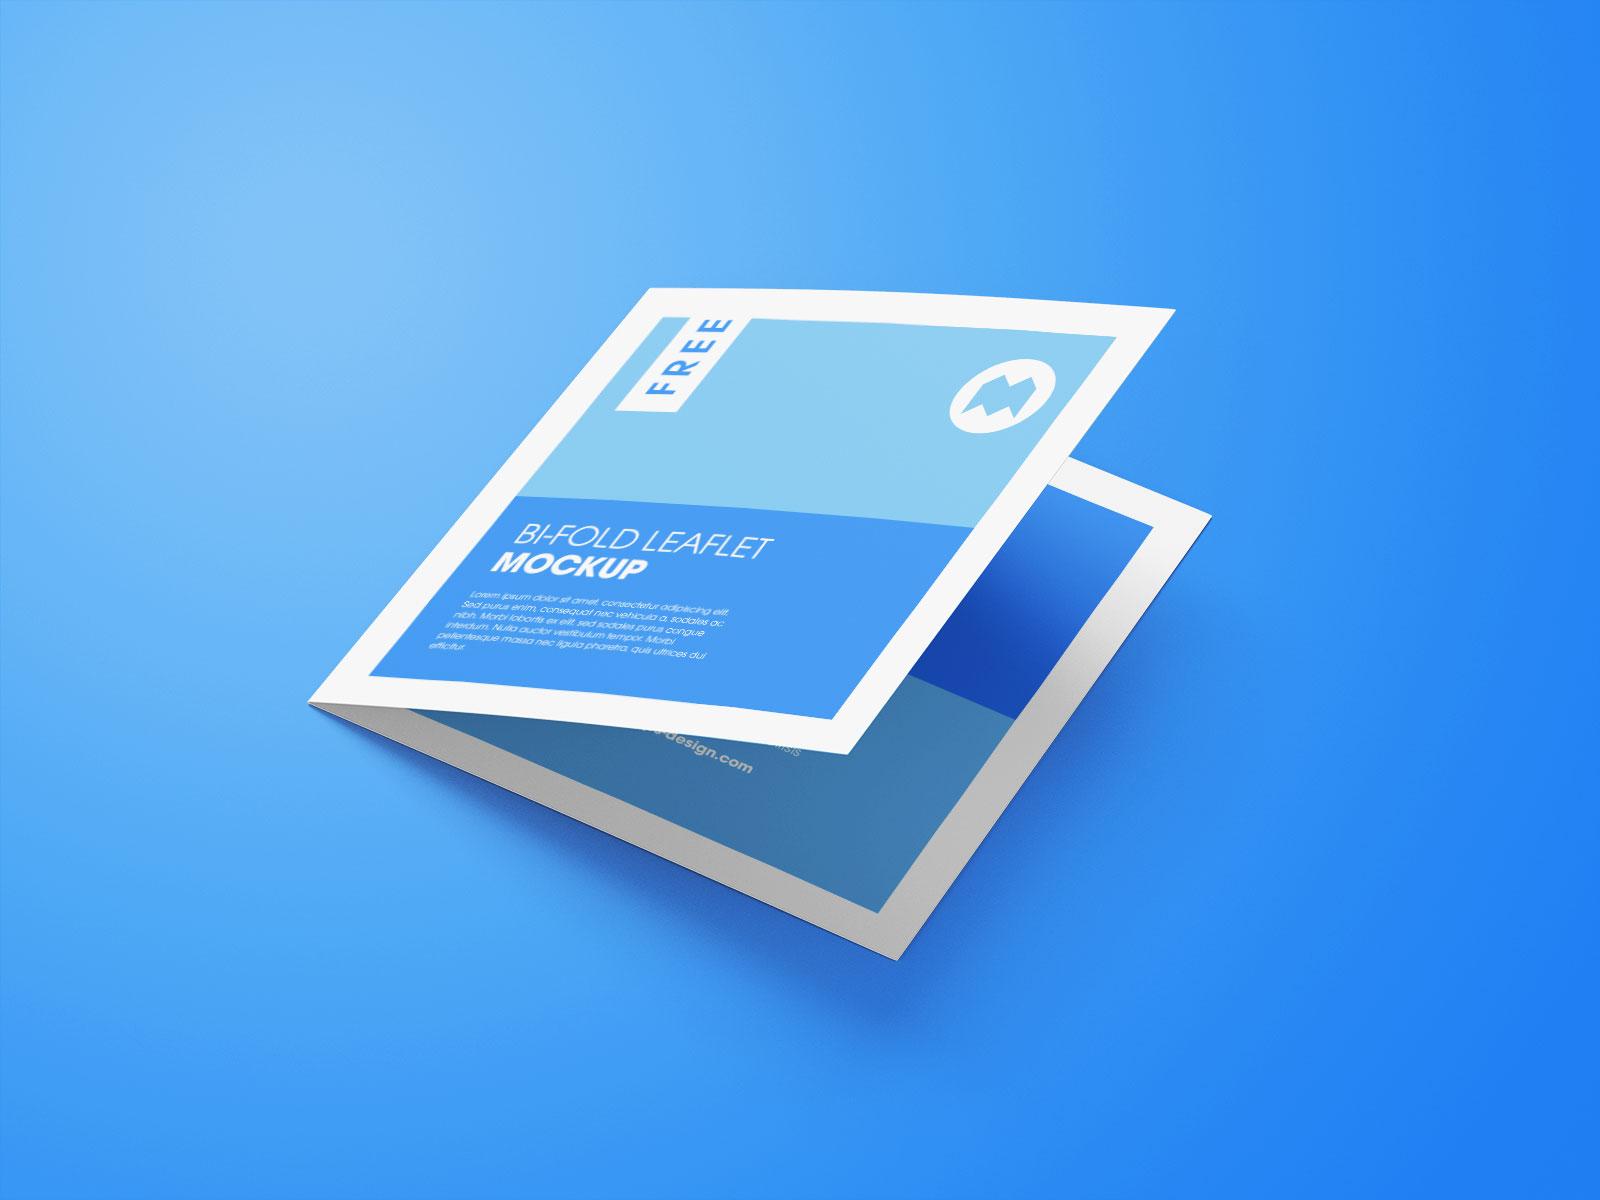 Free Square Bi-Fold Brochure Mockup PSD Set (5)